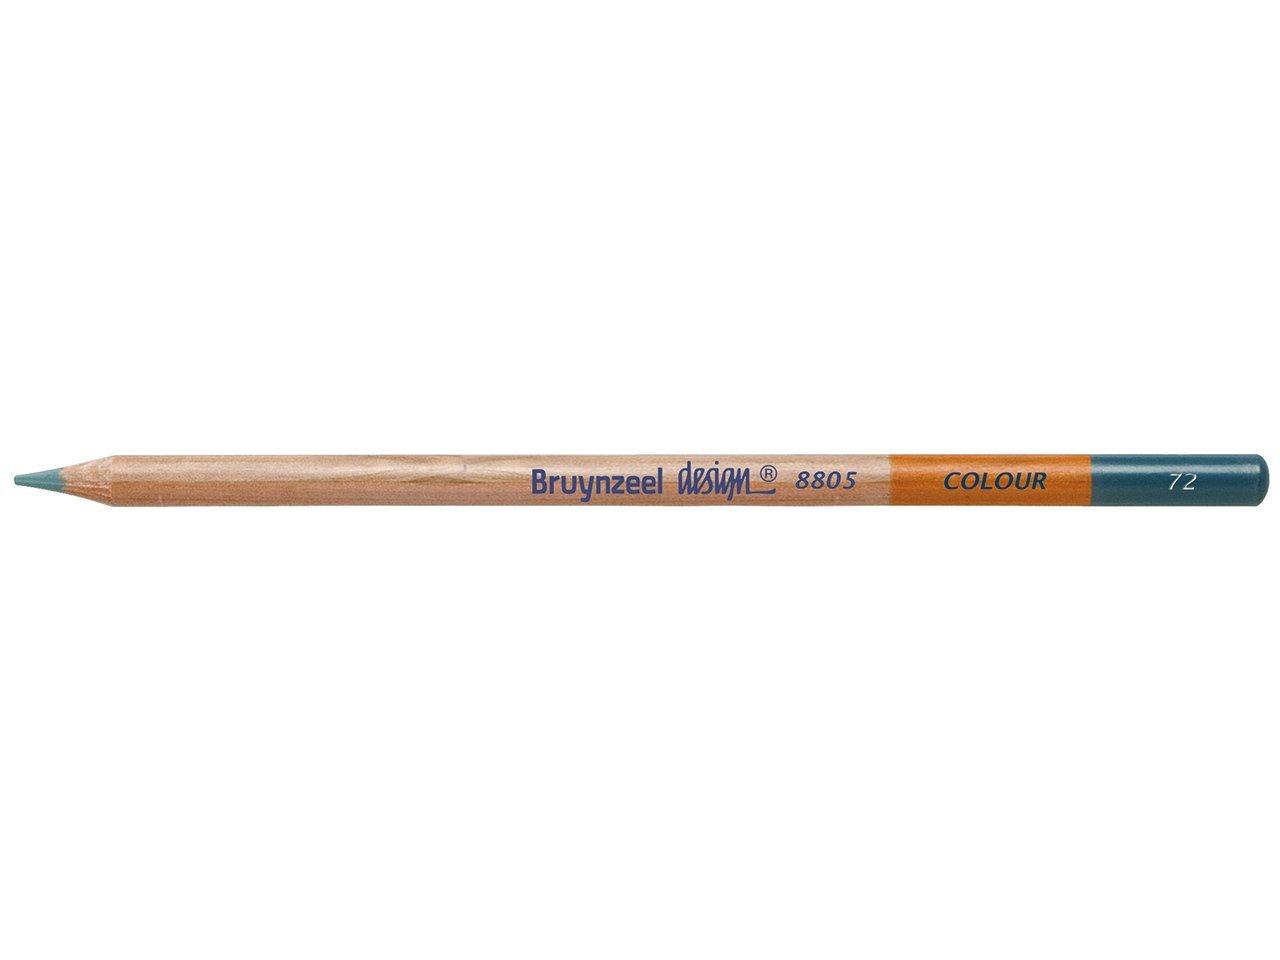 Bruynzeel Pencil - 72 Cold Grey